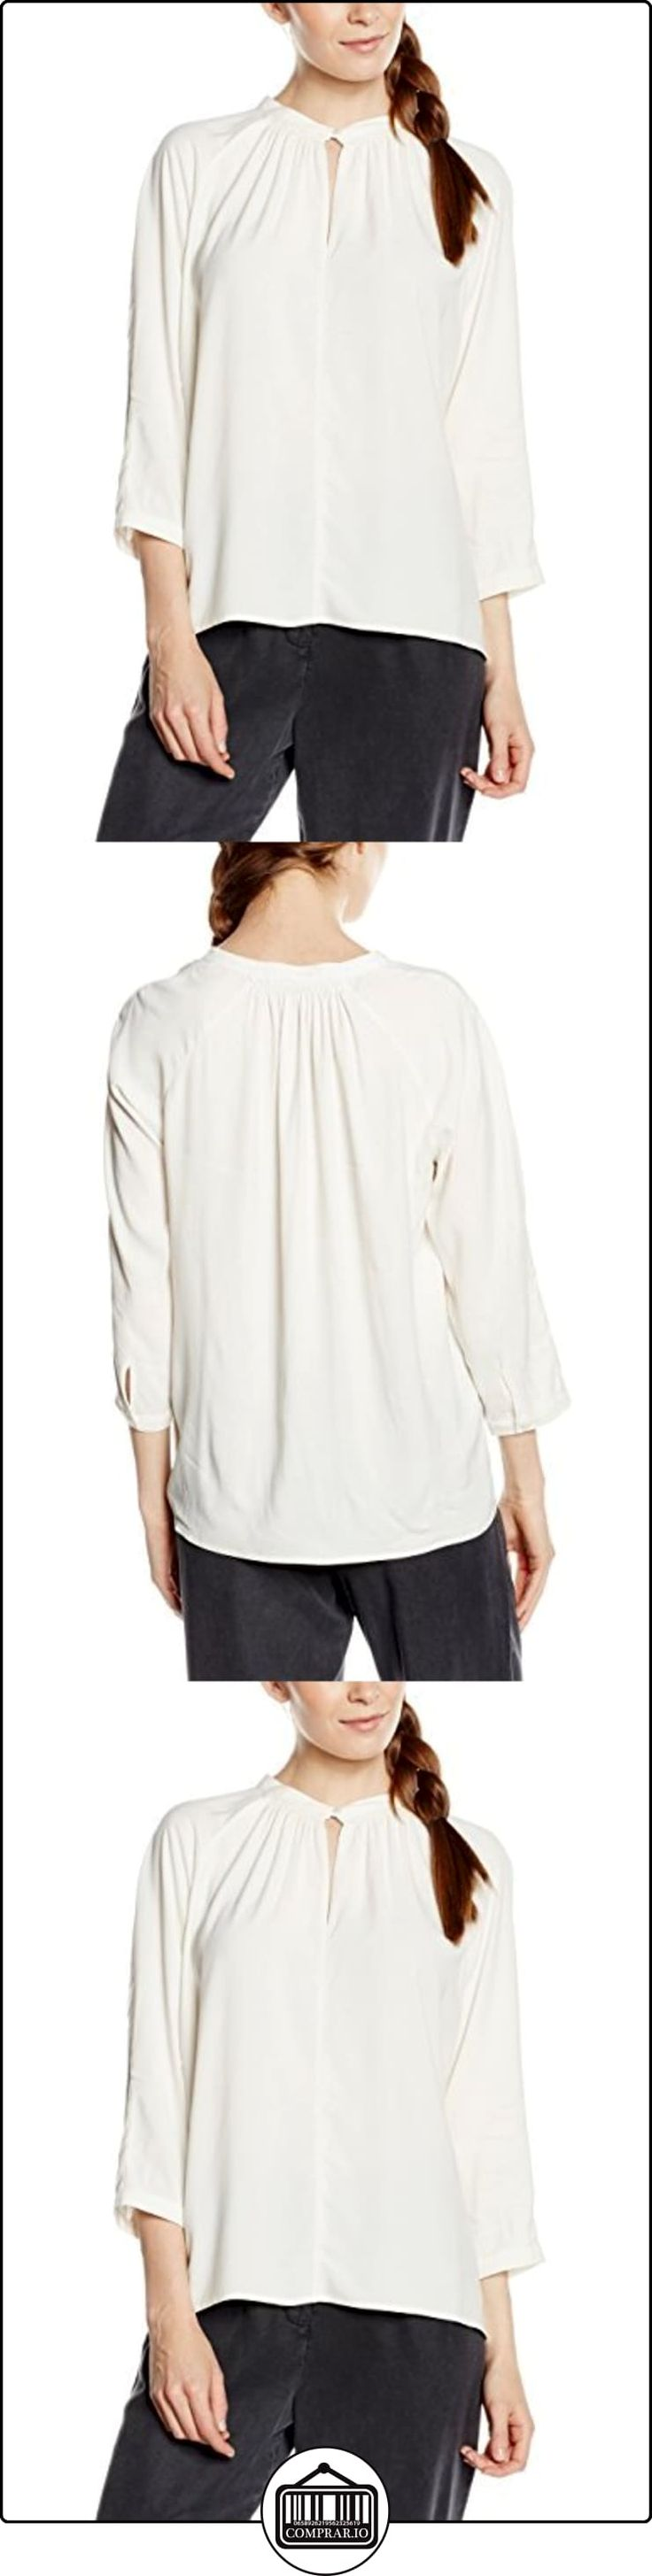 Marc O'Polo 607102942441, Blusa para Mujer, Elfenbein (White Cocoon 102), 38  ✿ Blusas y camisas ✿